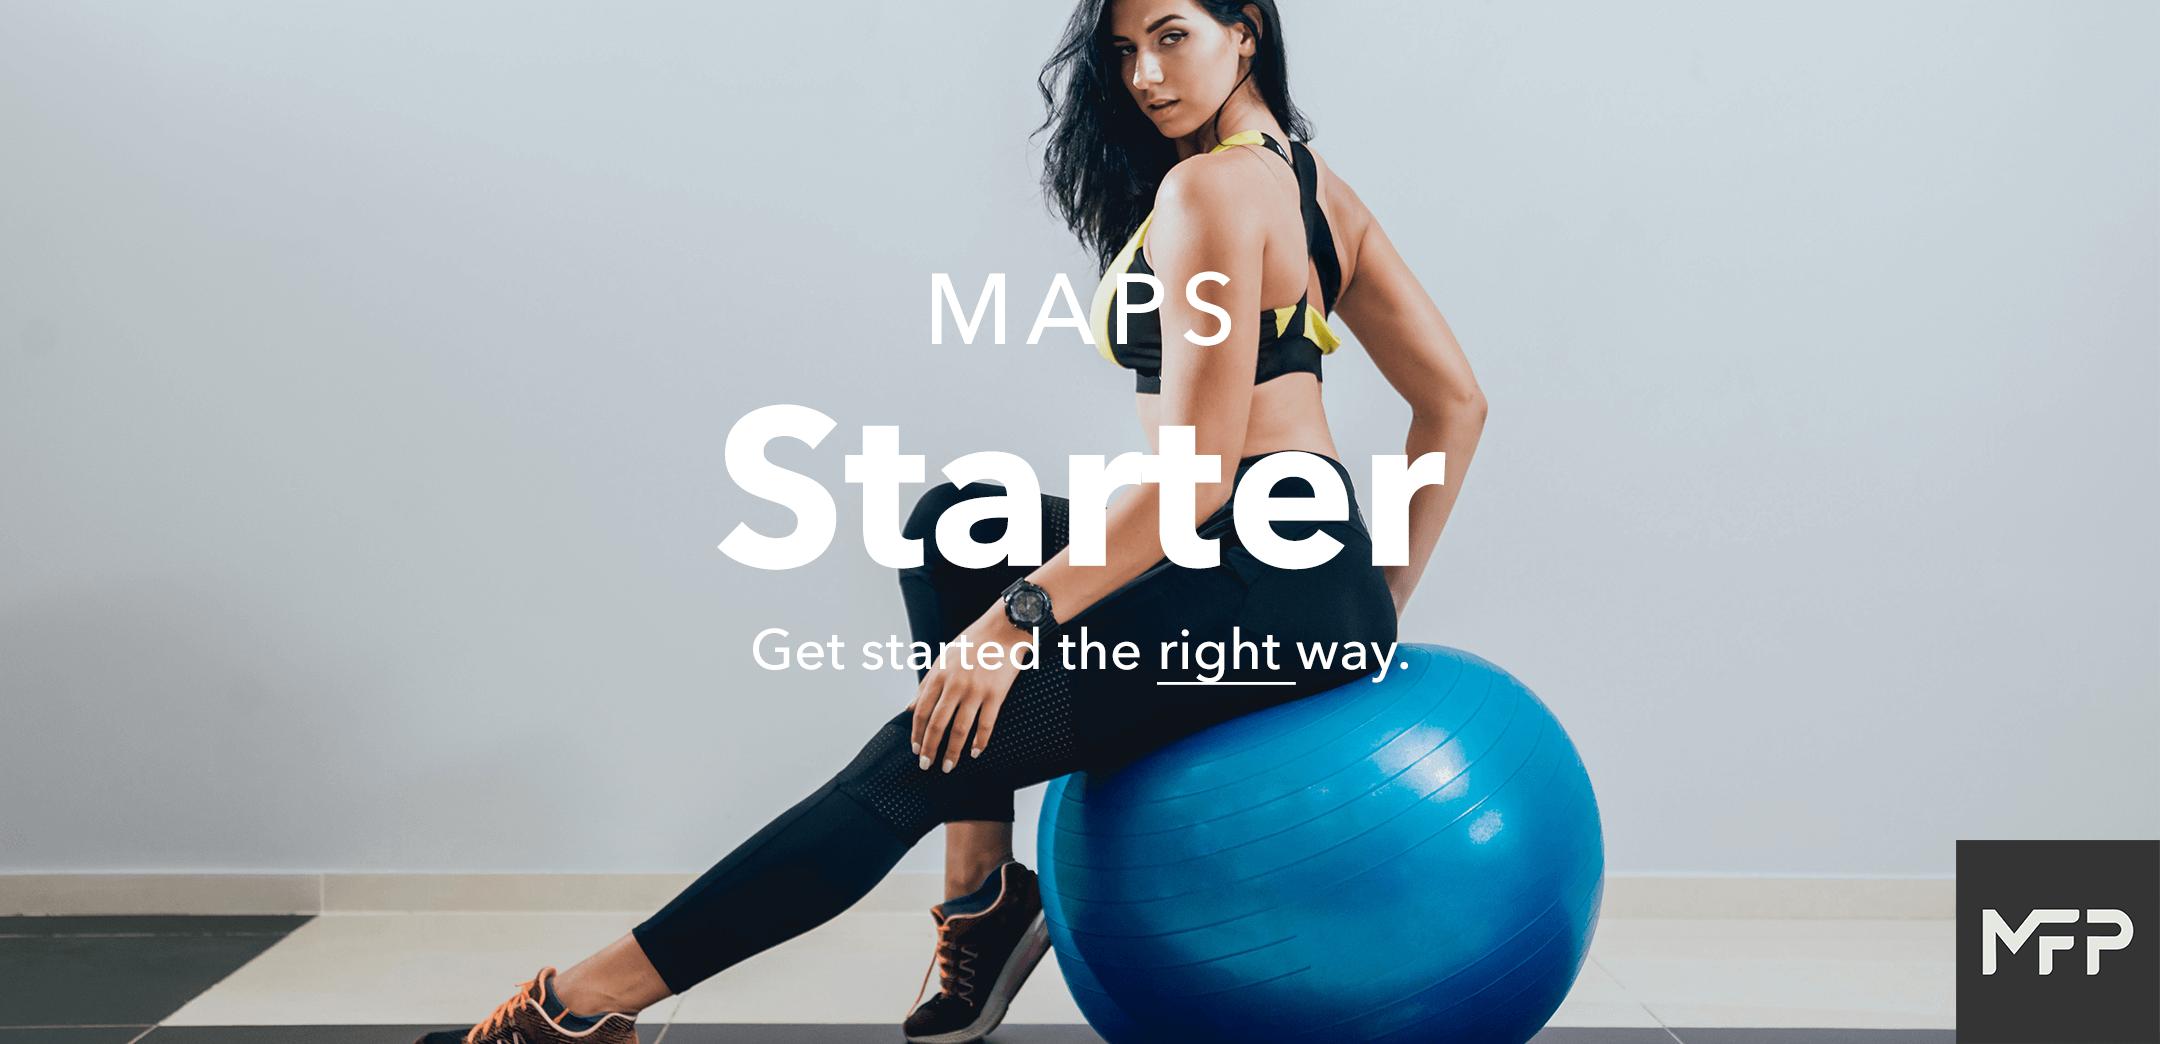 MAPS Starter Landing Page Banner